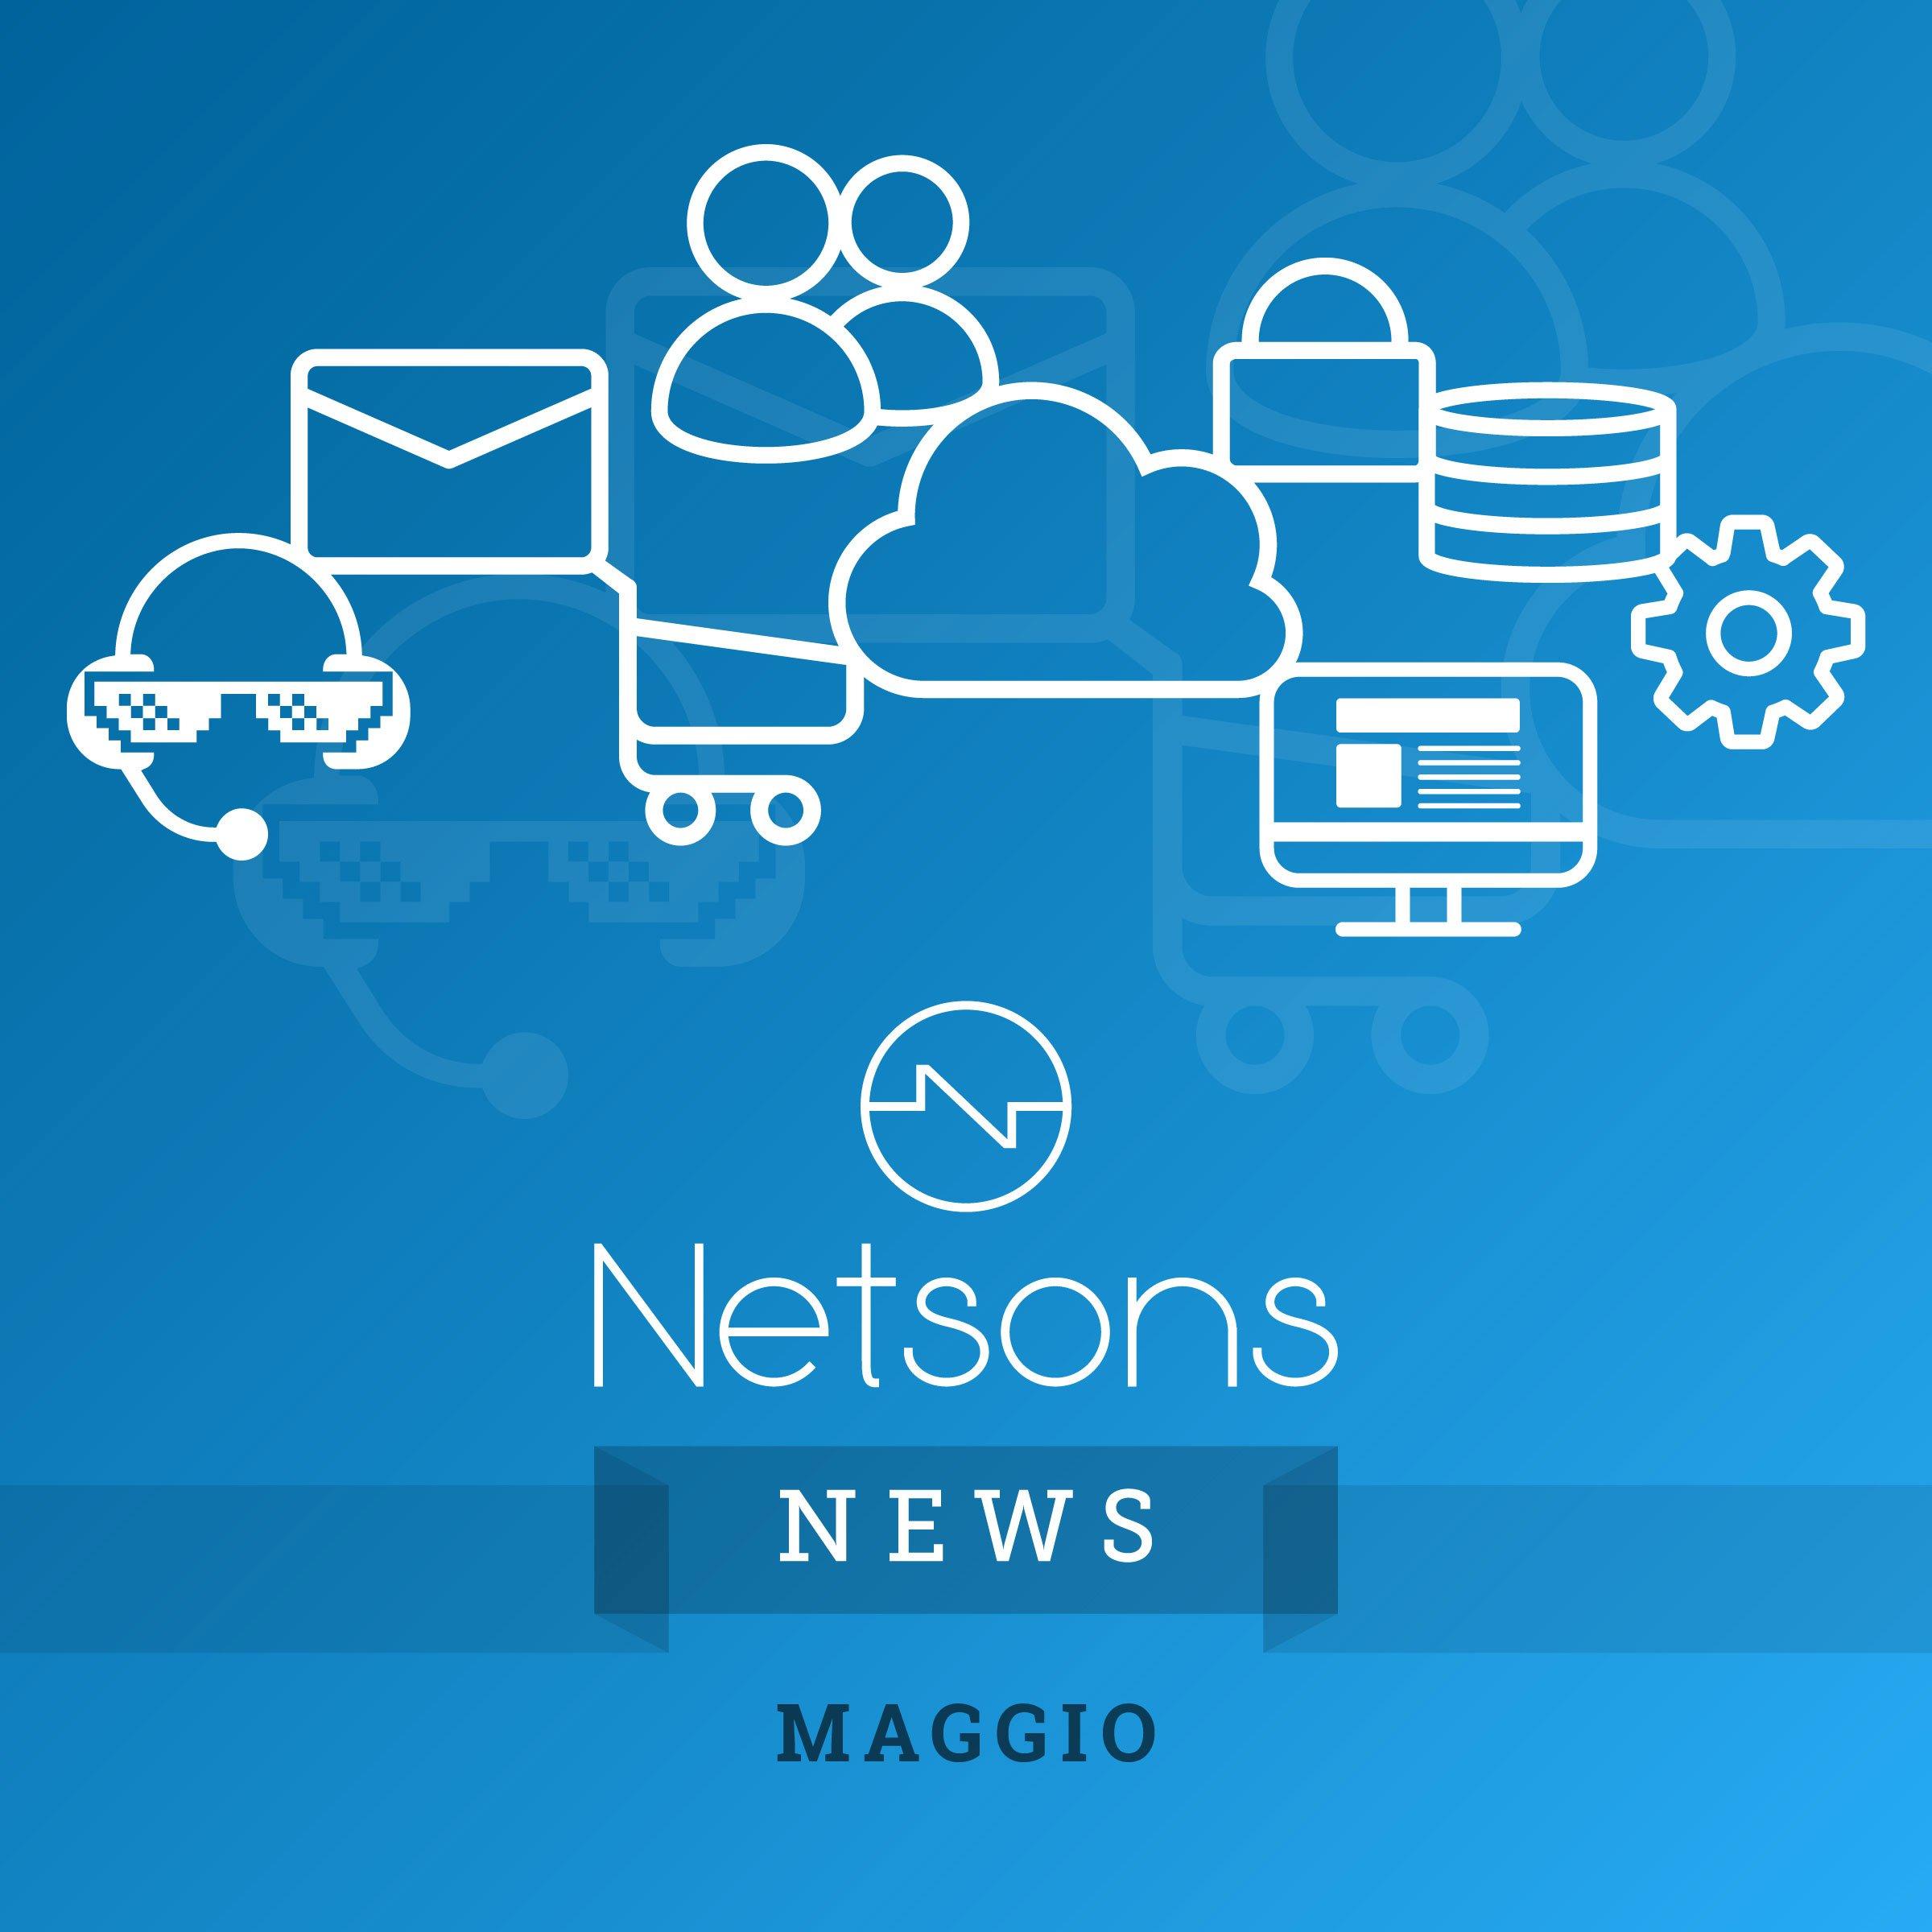 netsons news maggio